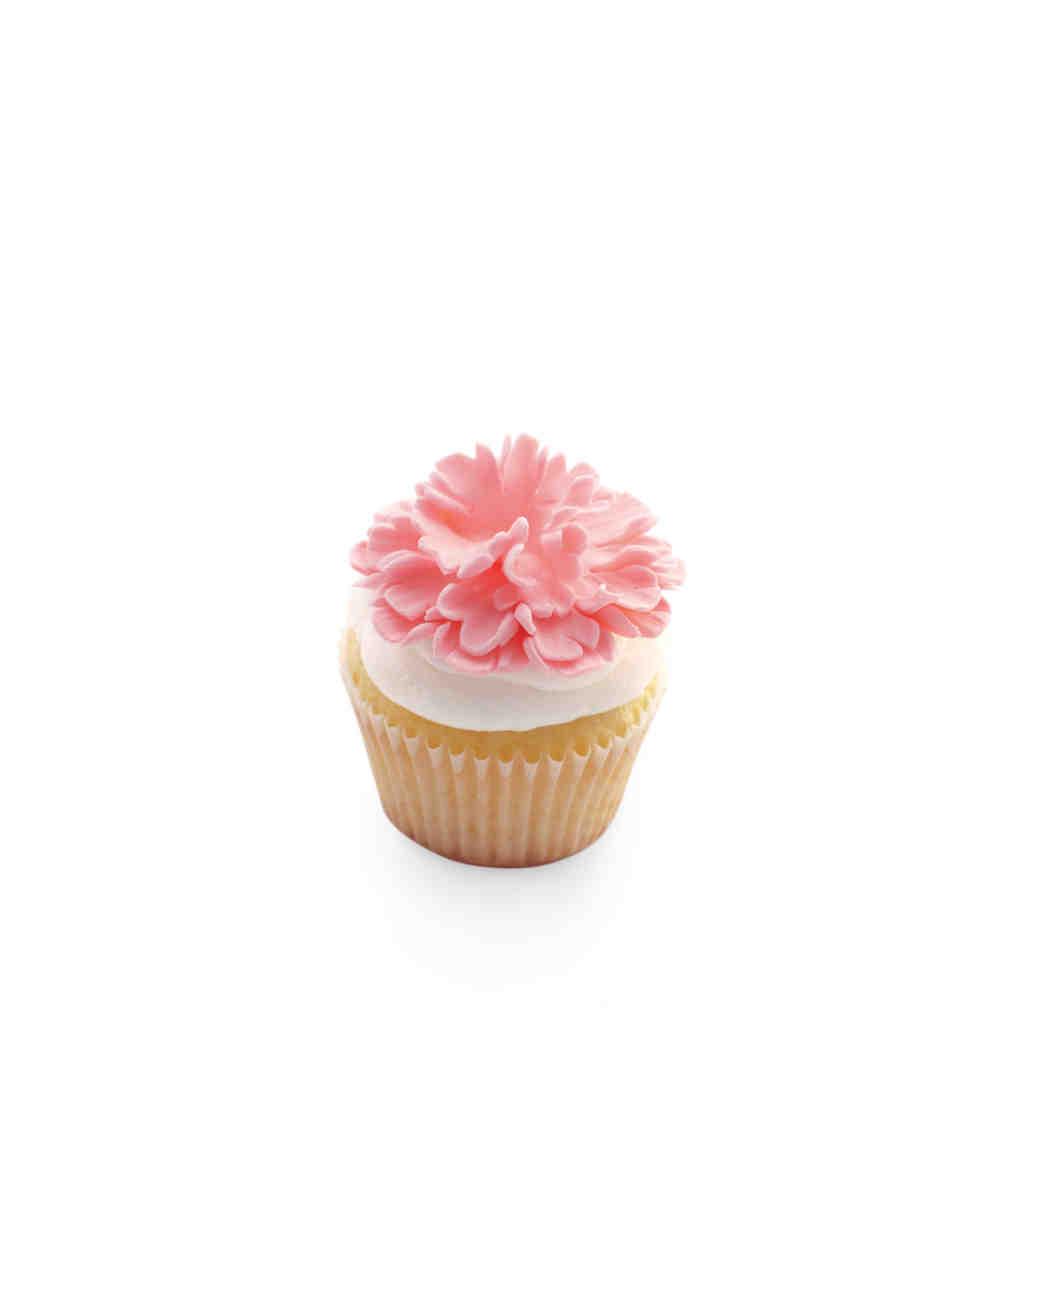 handmade-cupcake-mwd108612.jpg